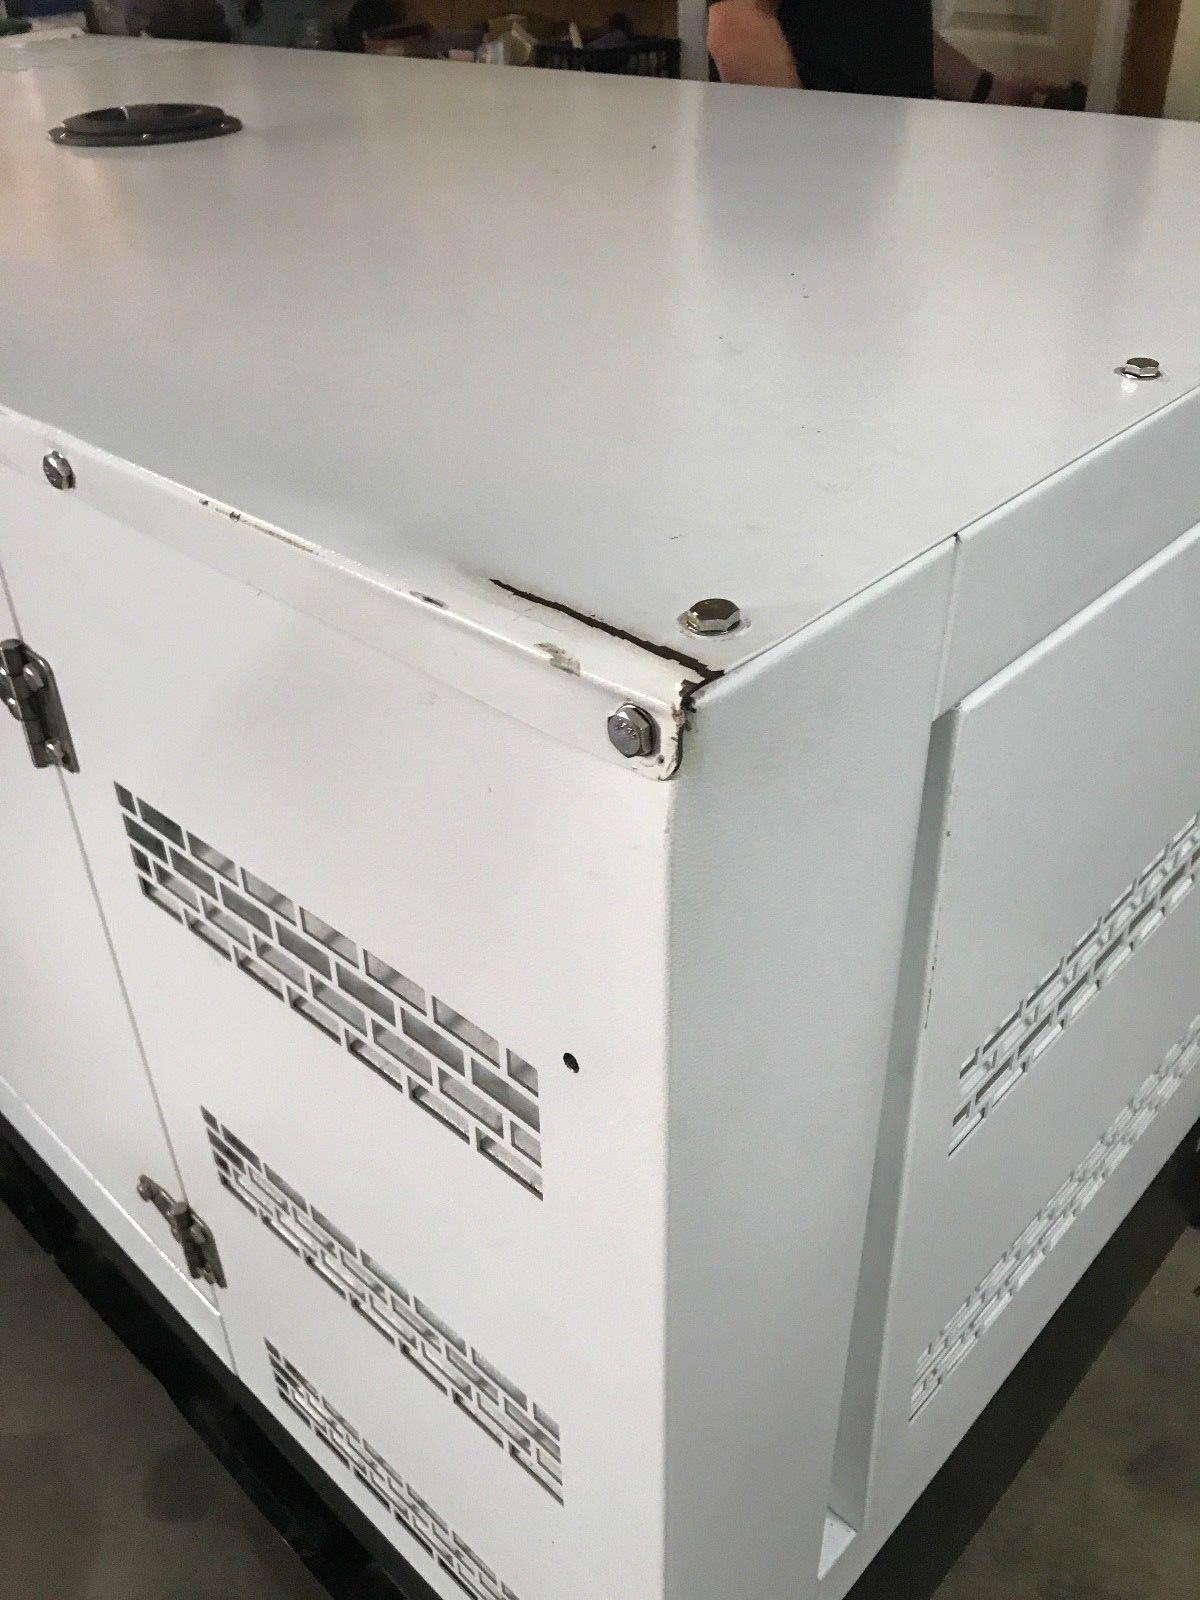 A new 30kw 60hz 120 240v single phase 4cyl turbo sel generator